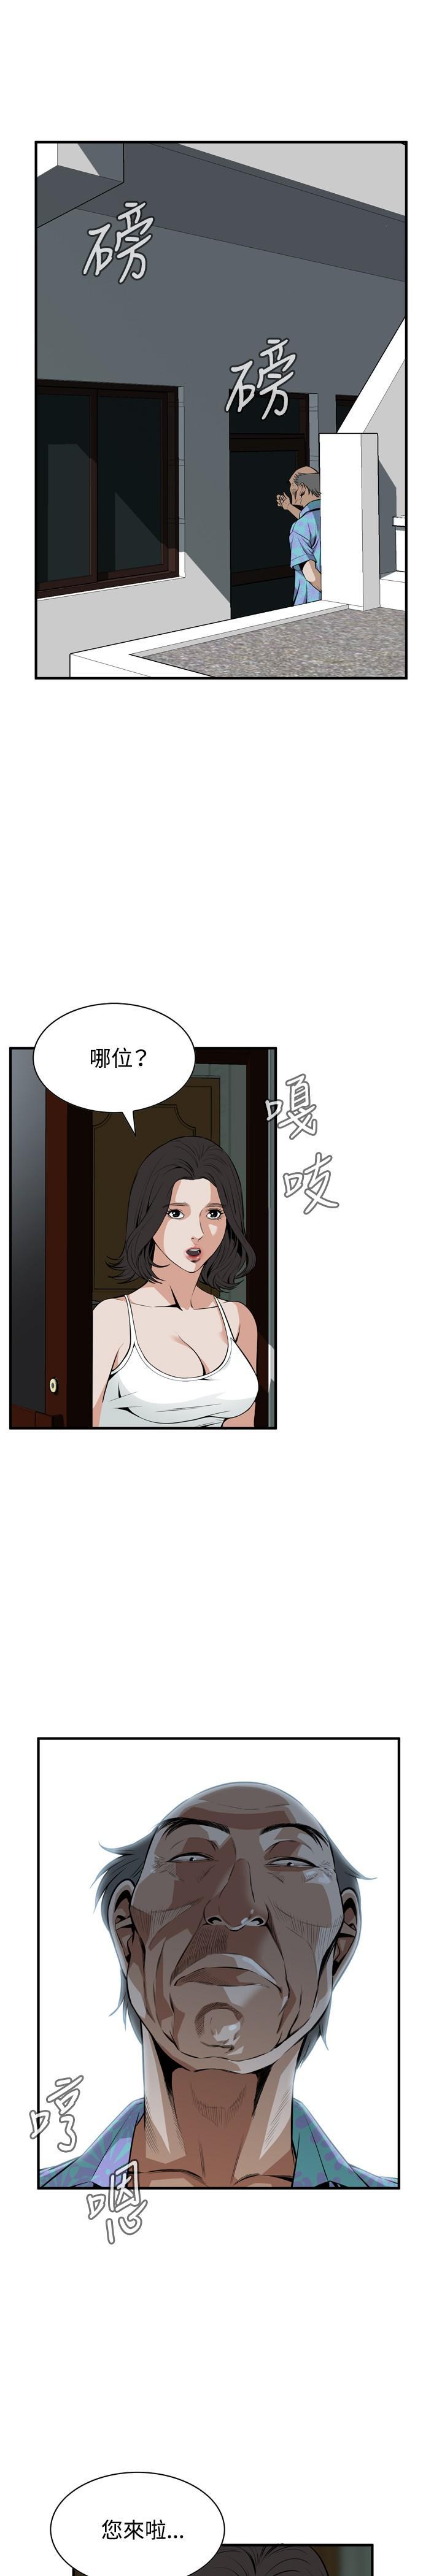 Take a Peek 偷窥 Ch.39~55 [Chinese]中文 113